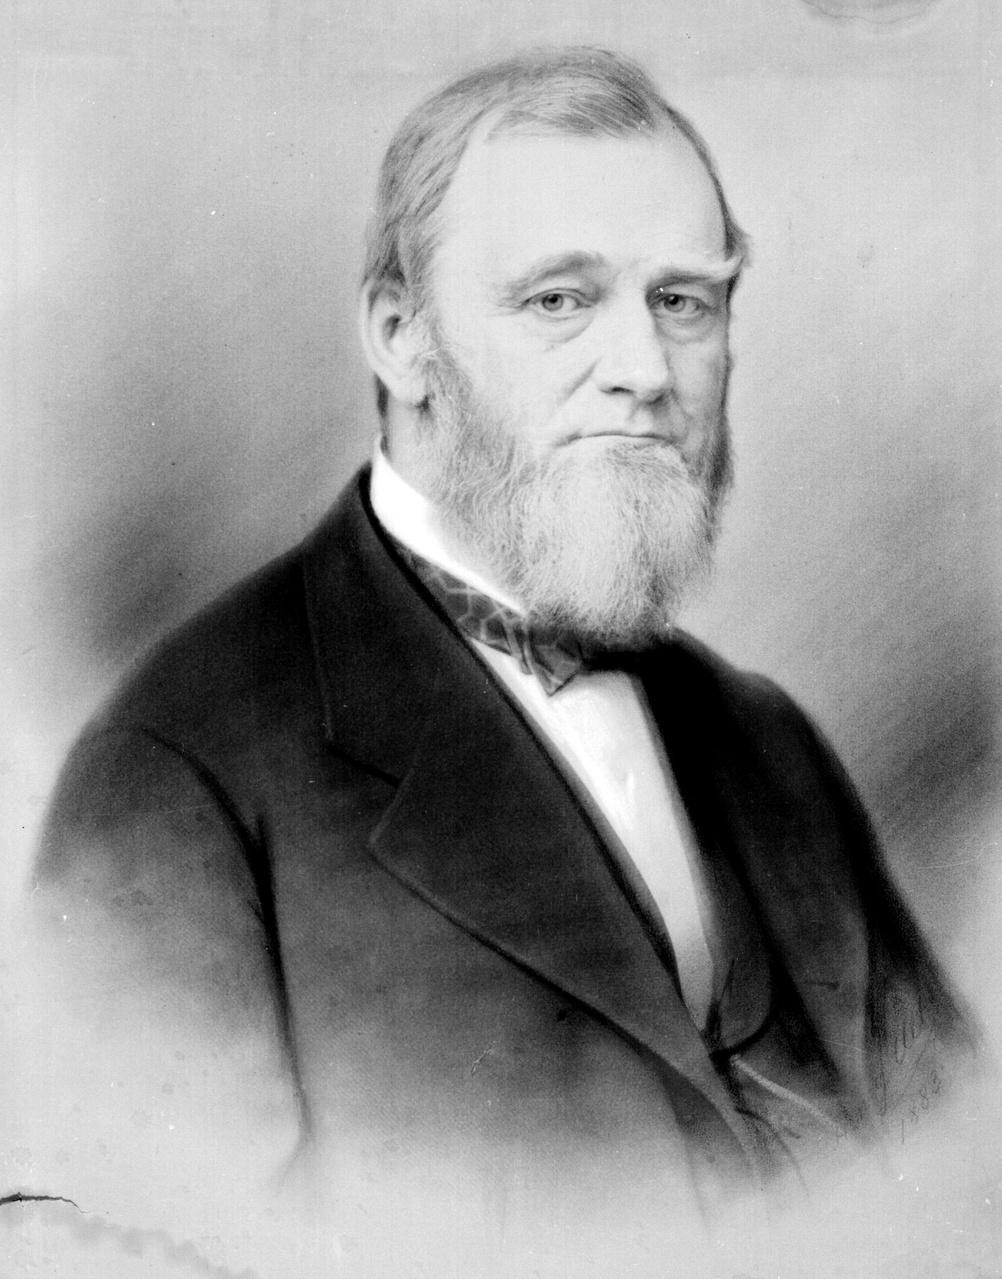 Portrait of Spencer Baird